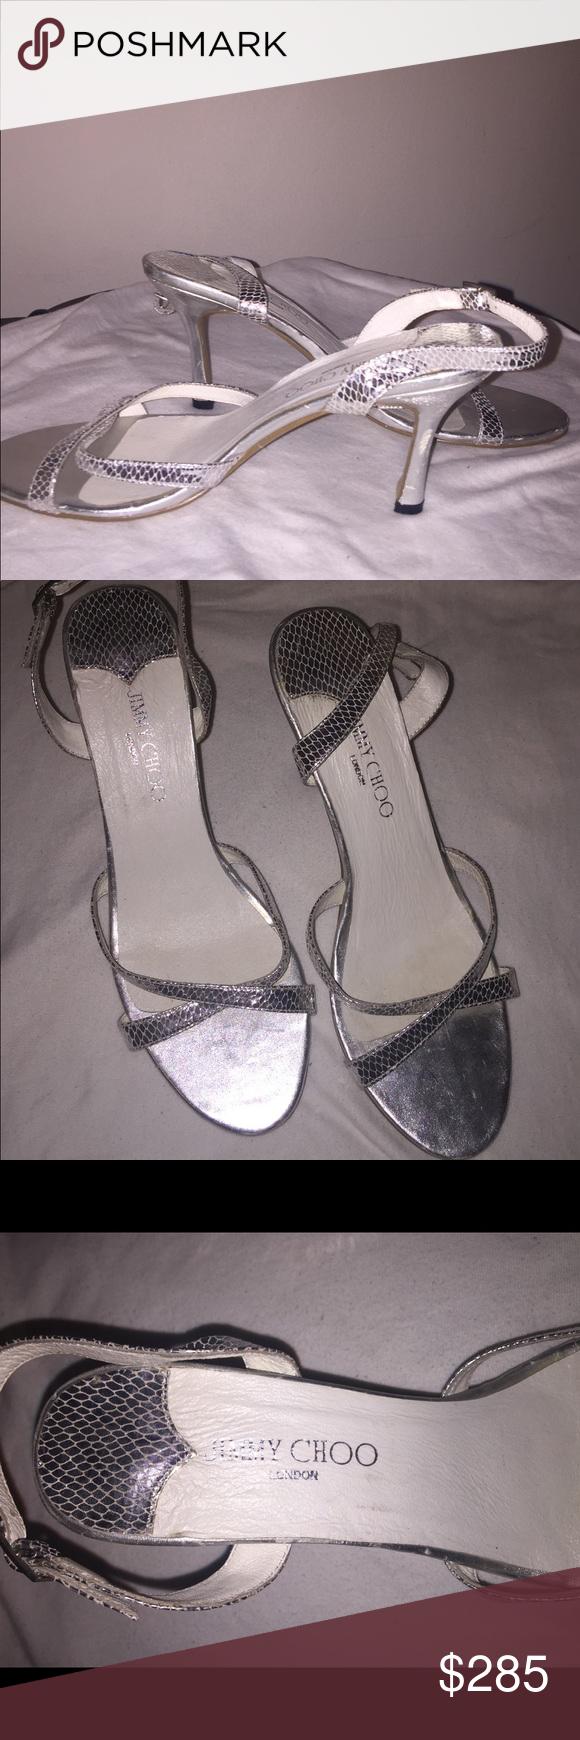 Jimmy Choo heels My Posh Closet Pinterest Jimmy choo Heels